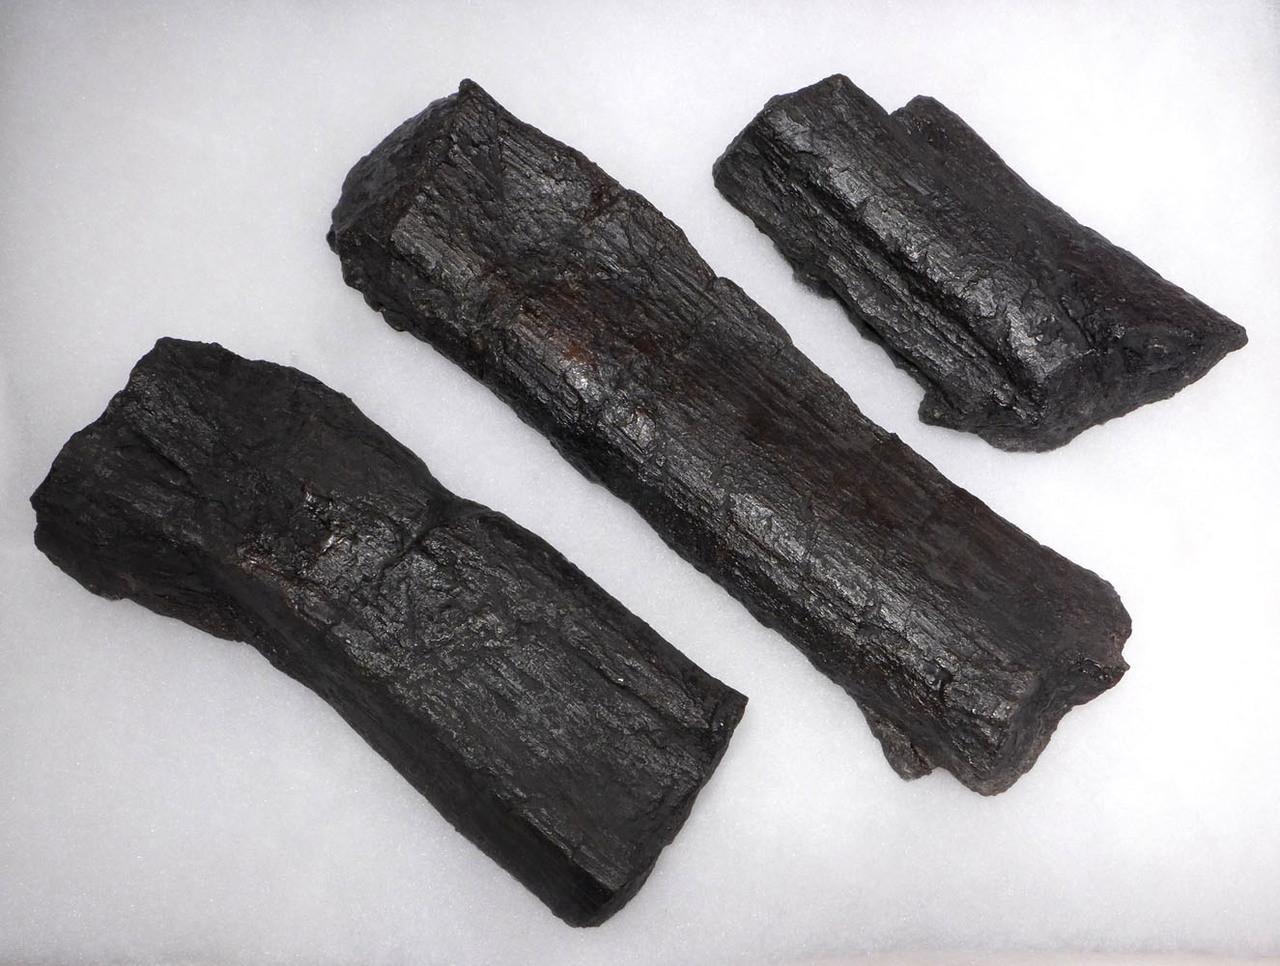 CAMARASAURUS GIANT SAUROPOD JURASSIC DINOSAUR FOSSIL RIB BONES *DBX026